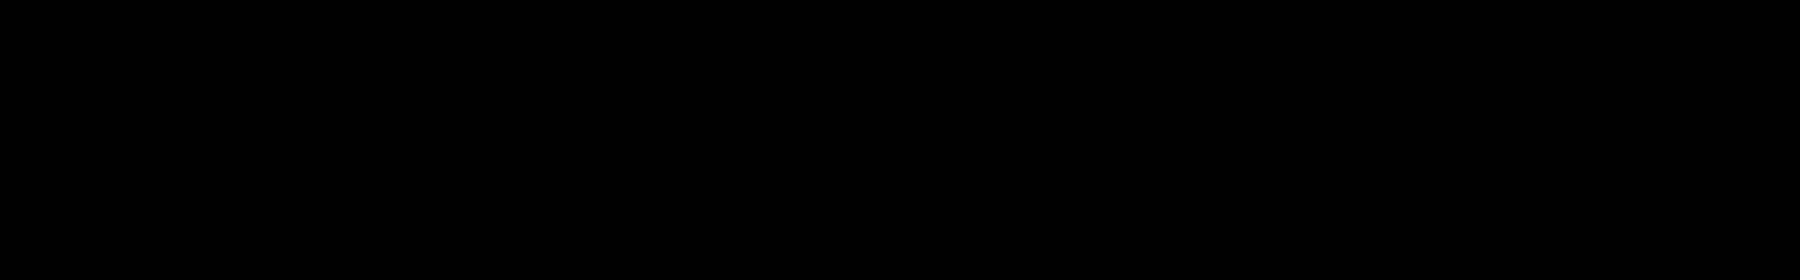 Techno Code audio waveform